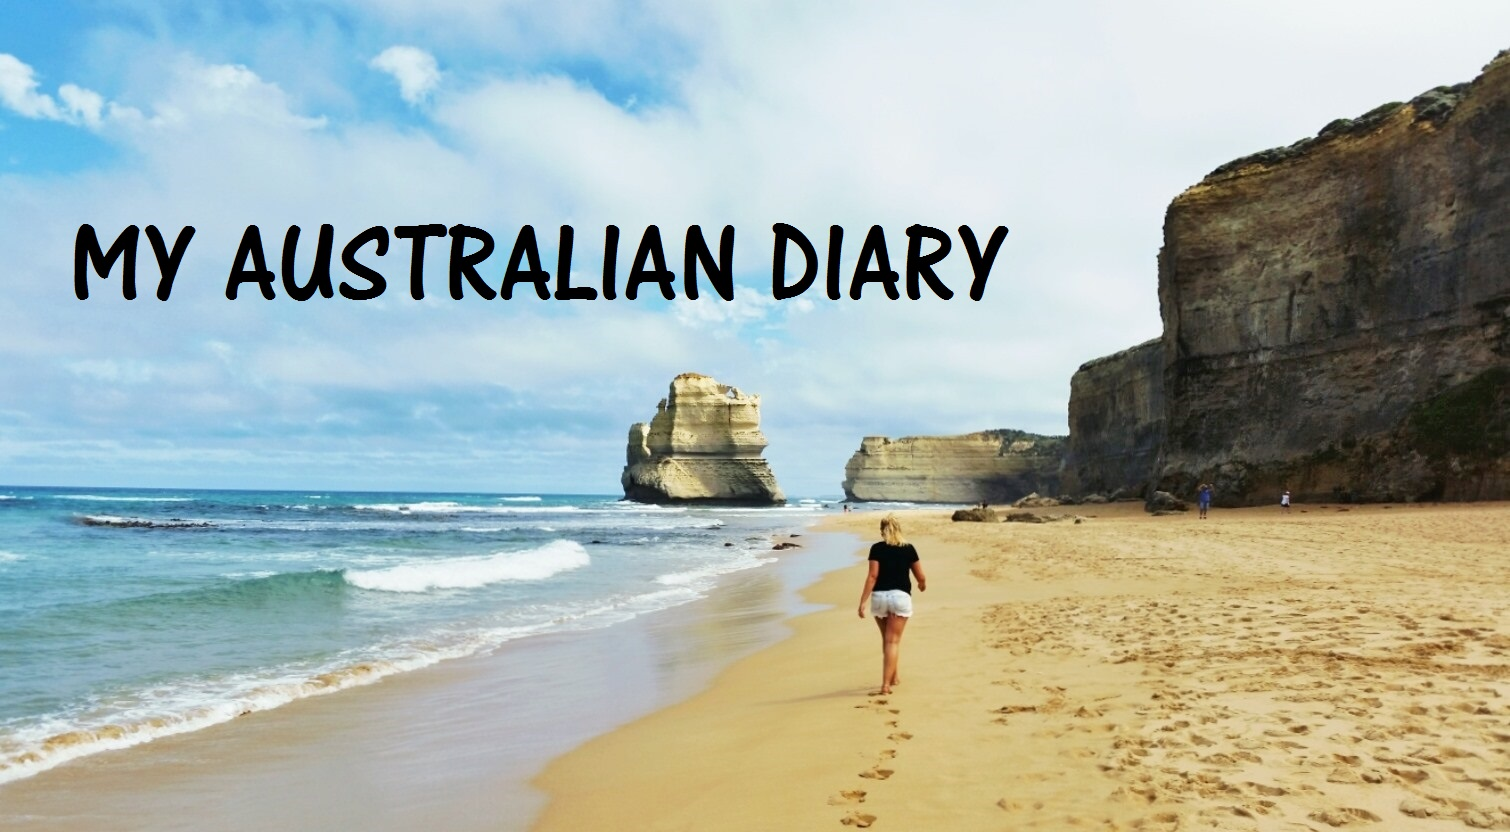 My Australian Diary